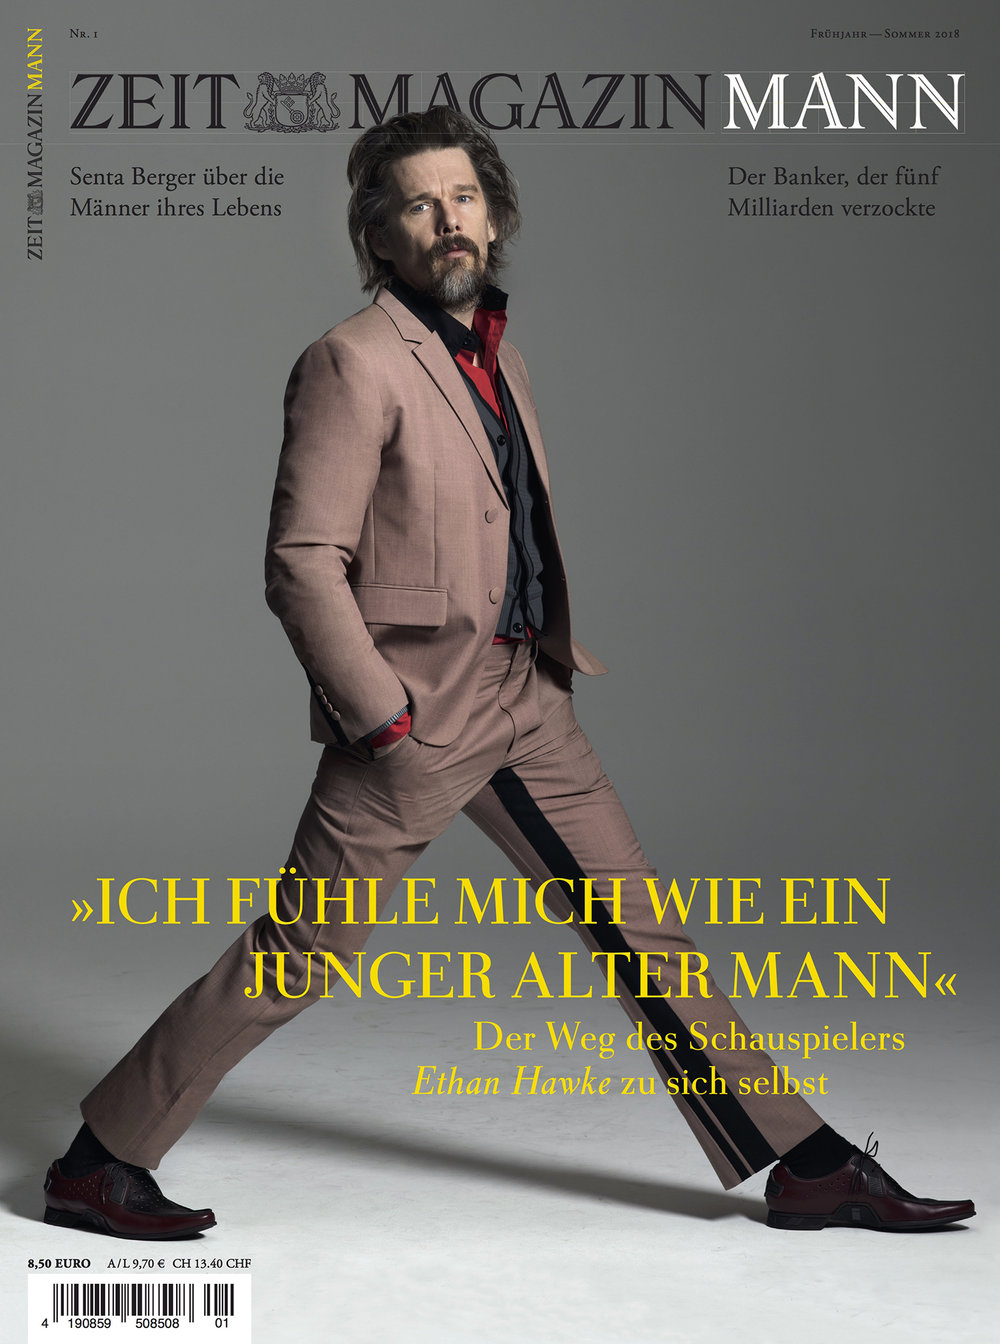 Zeit Magazine, Ethan Hawke, 2018